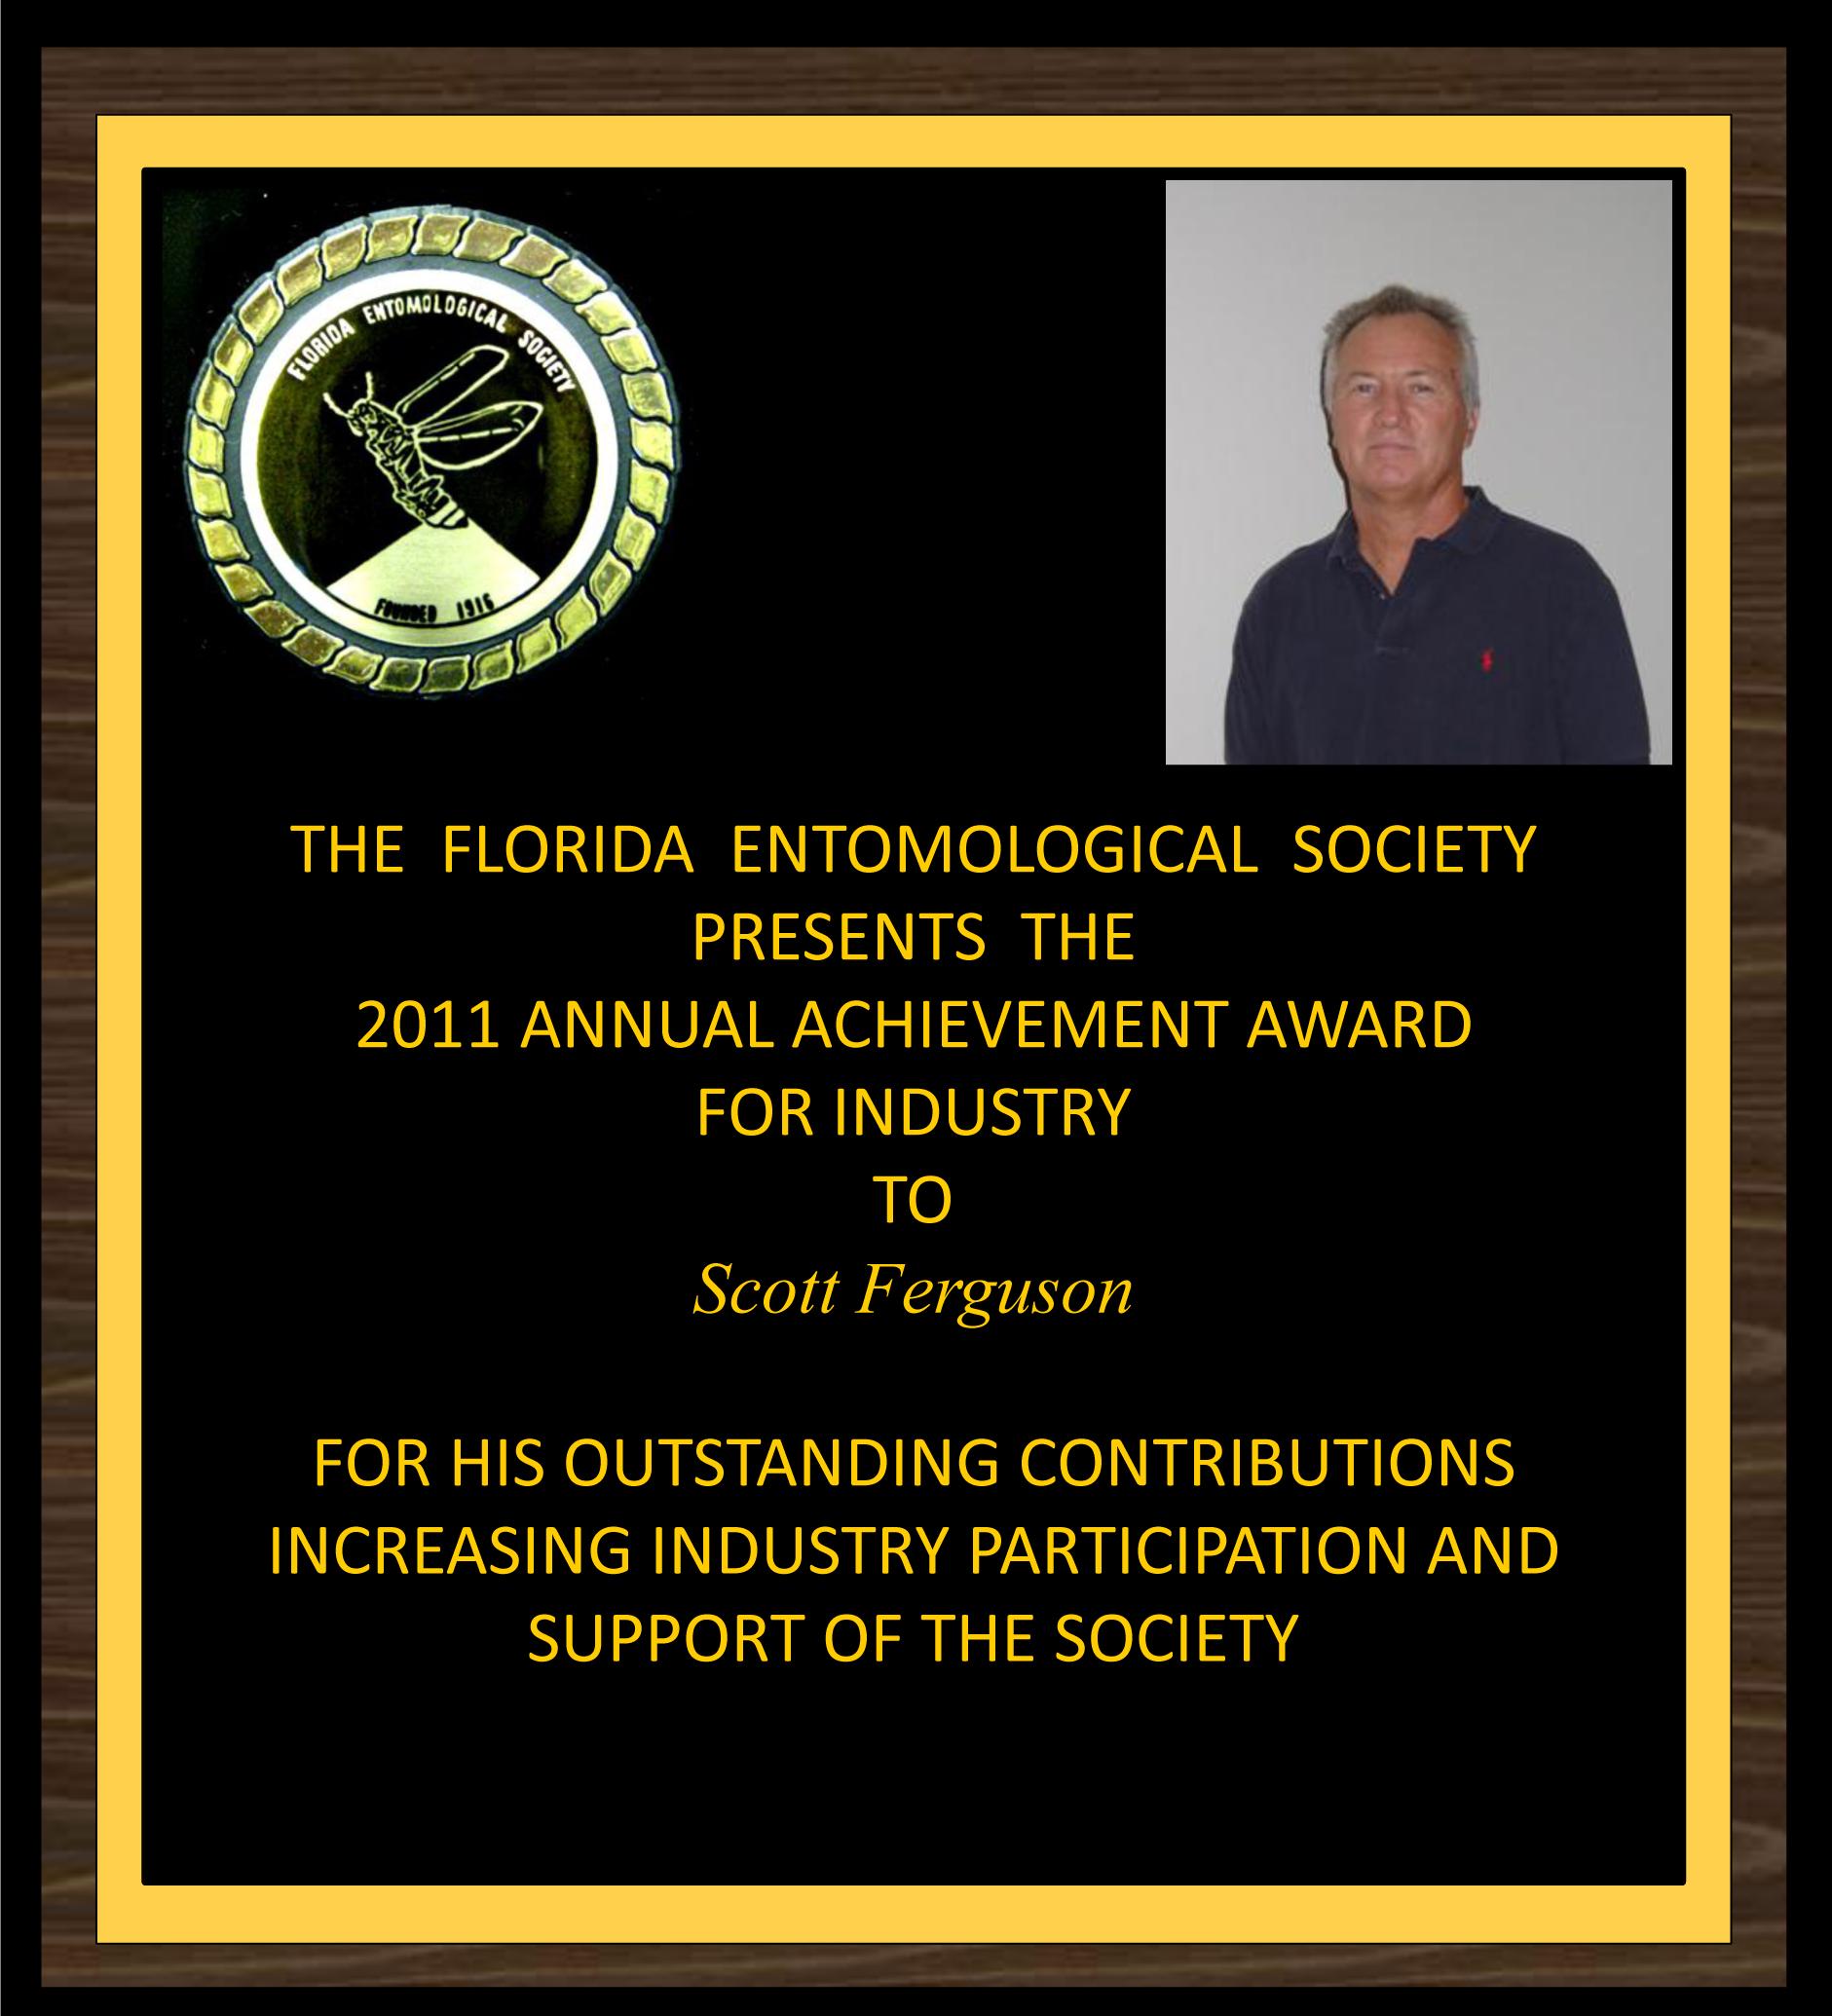 Scott Ferguson receives 2011 FES Achievement Award for Industry